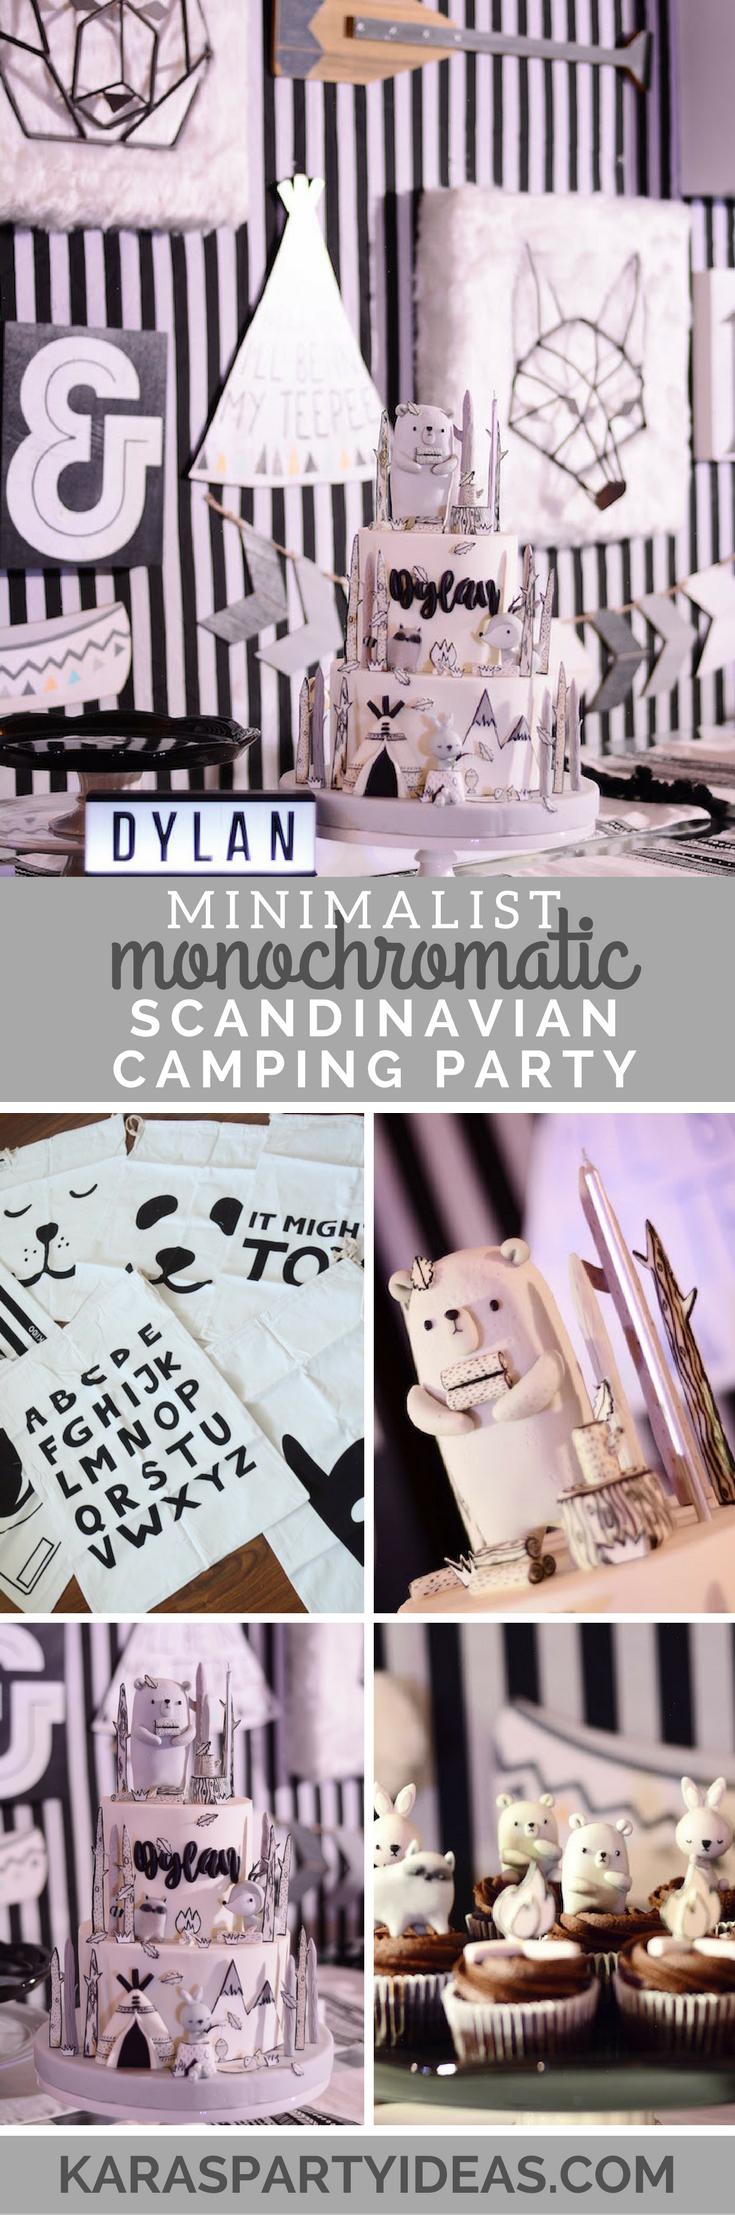 Minimalist Monochromatic Scandinavian Camping Party via Kara's Party Ideas - KarasPartyIdeas.com